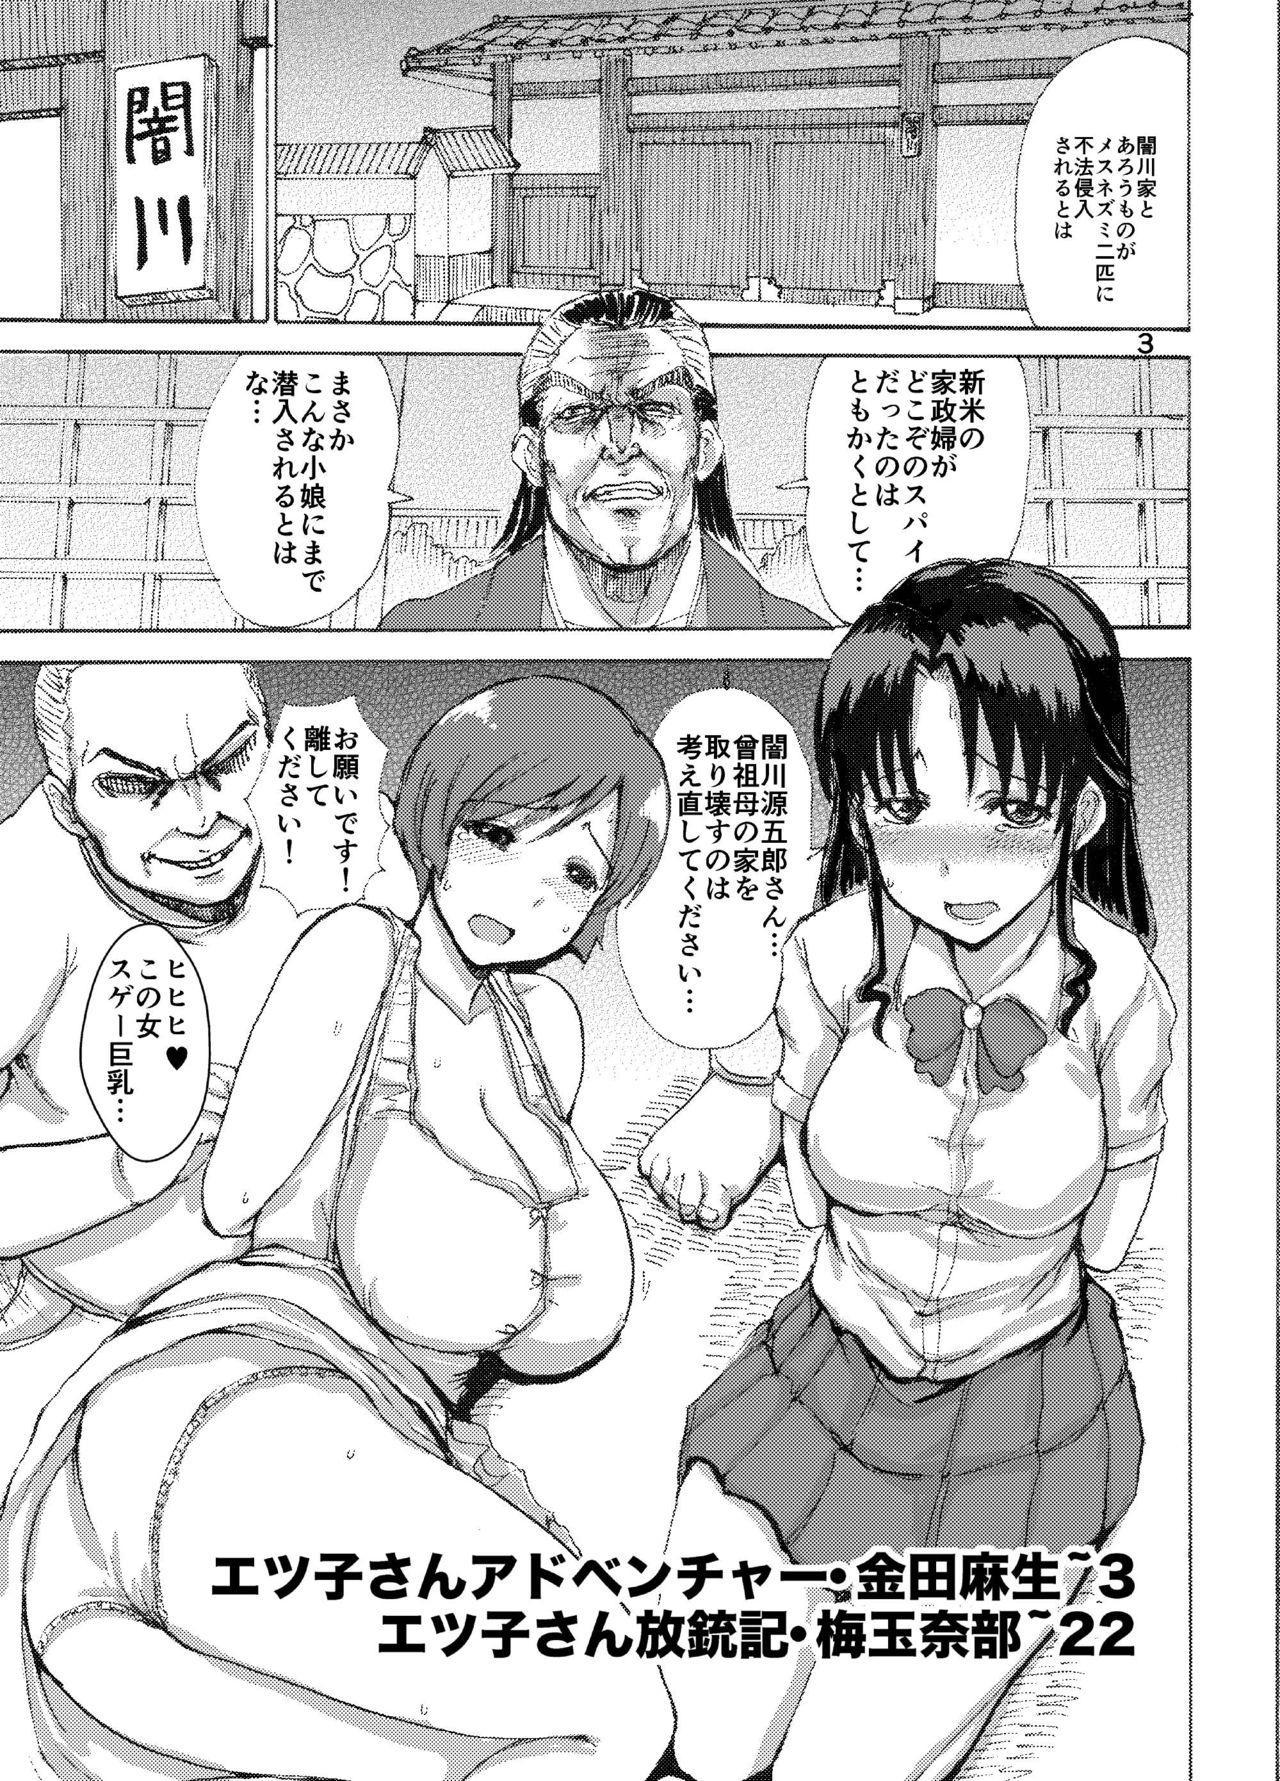 Etsuko-san Adventure 1